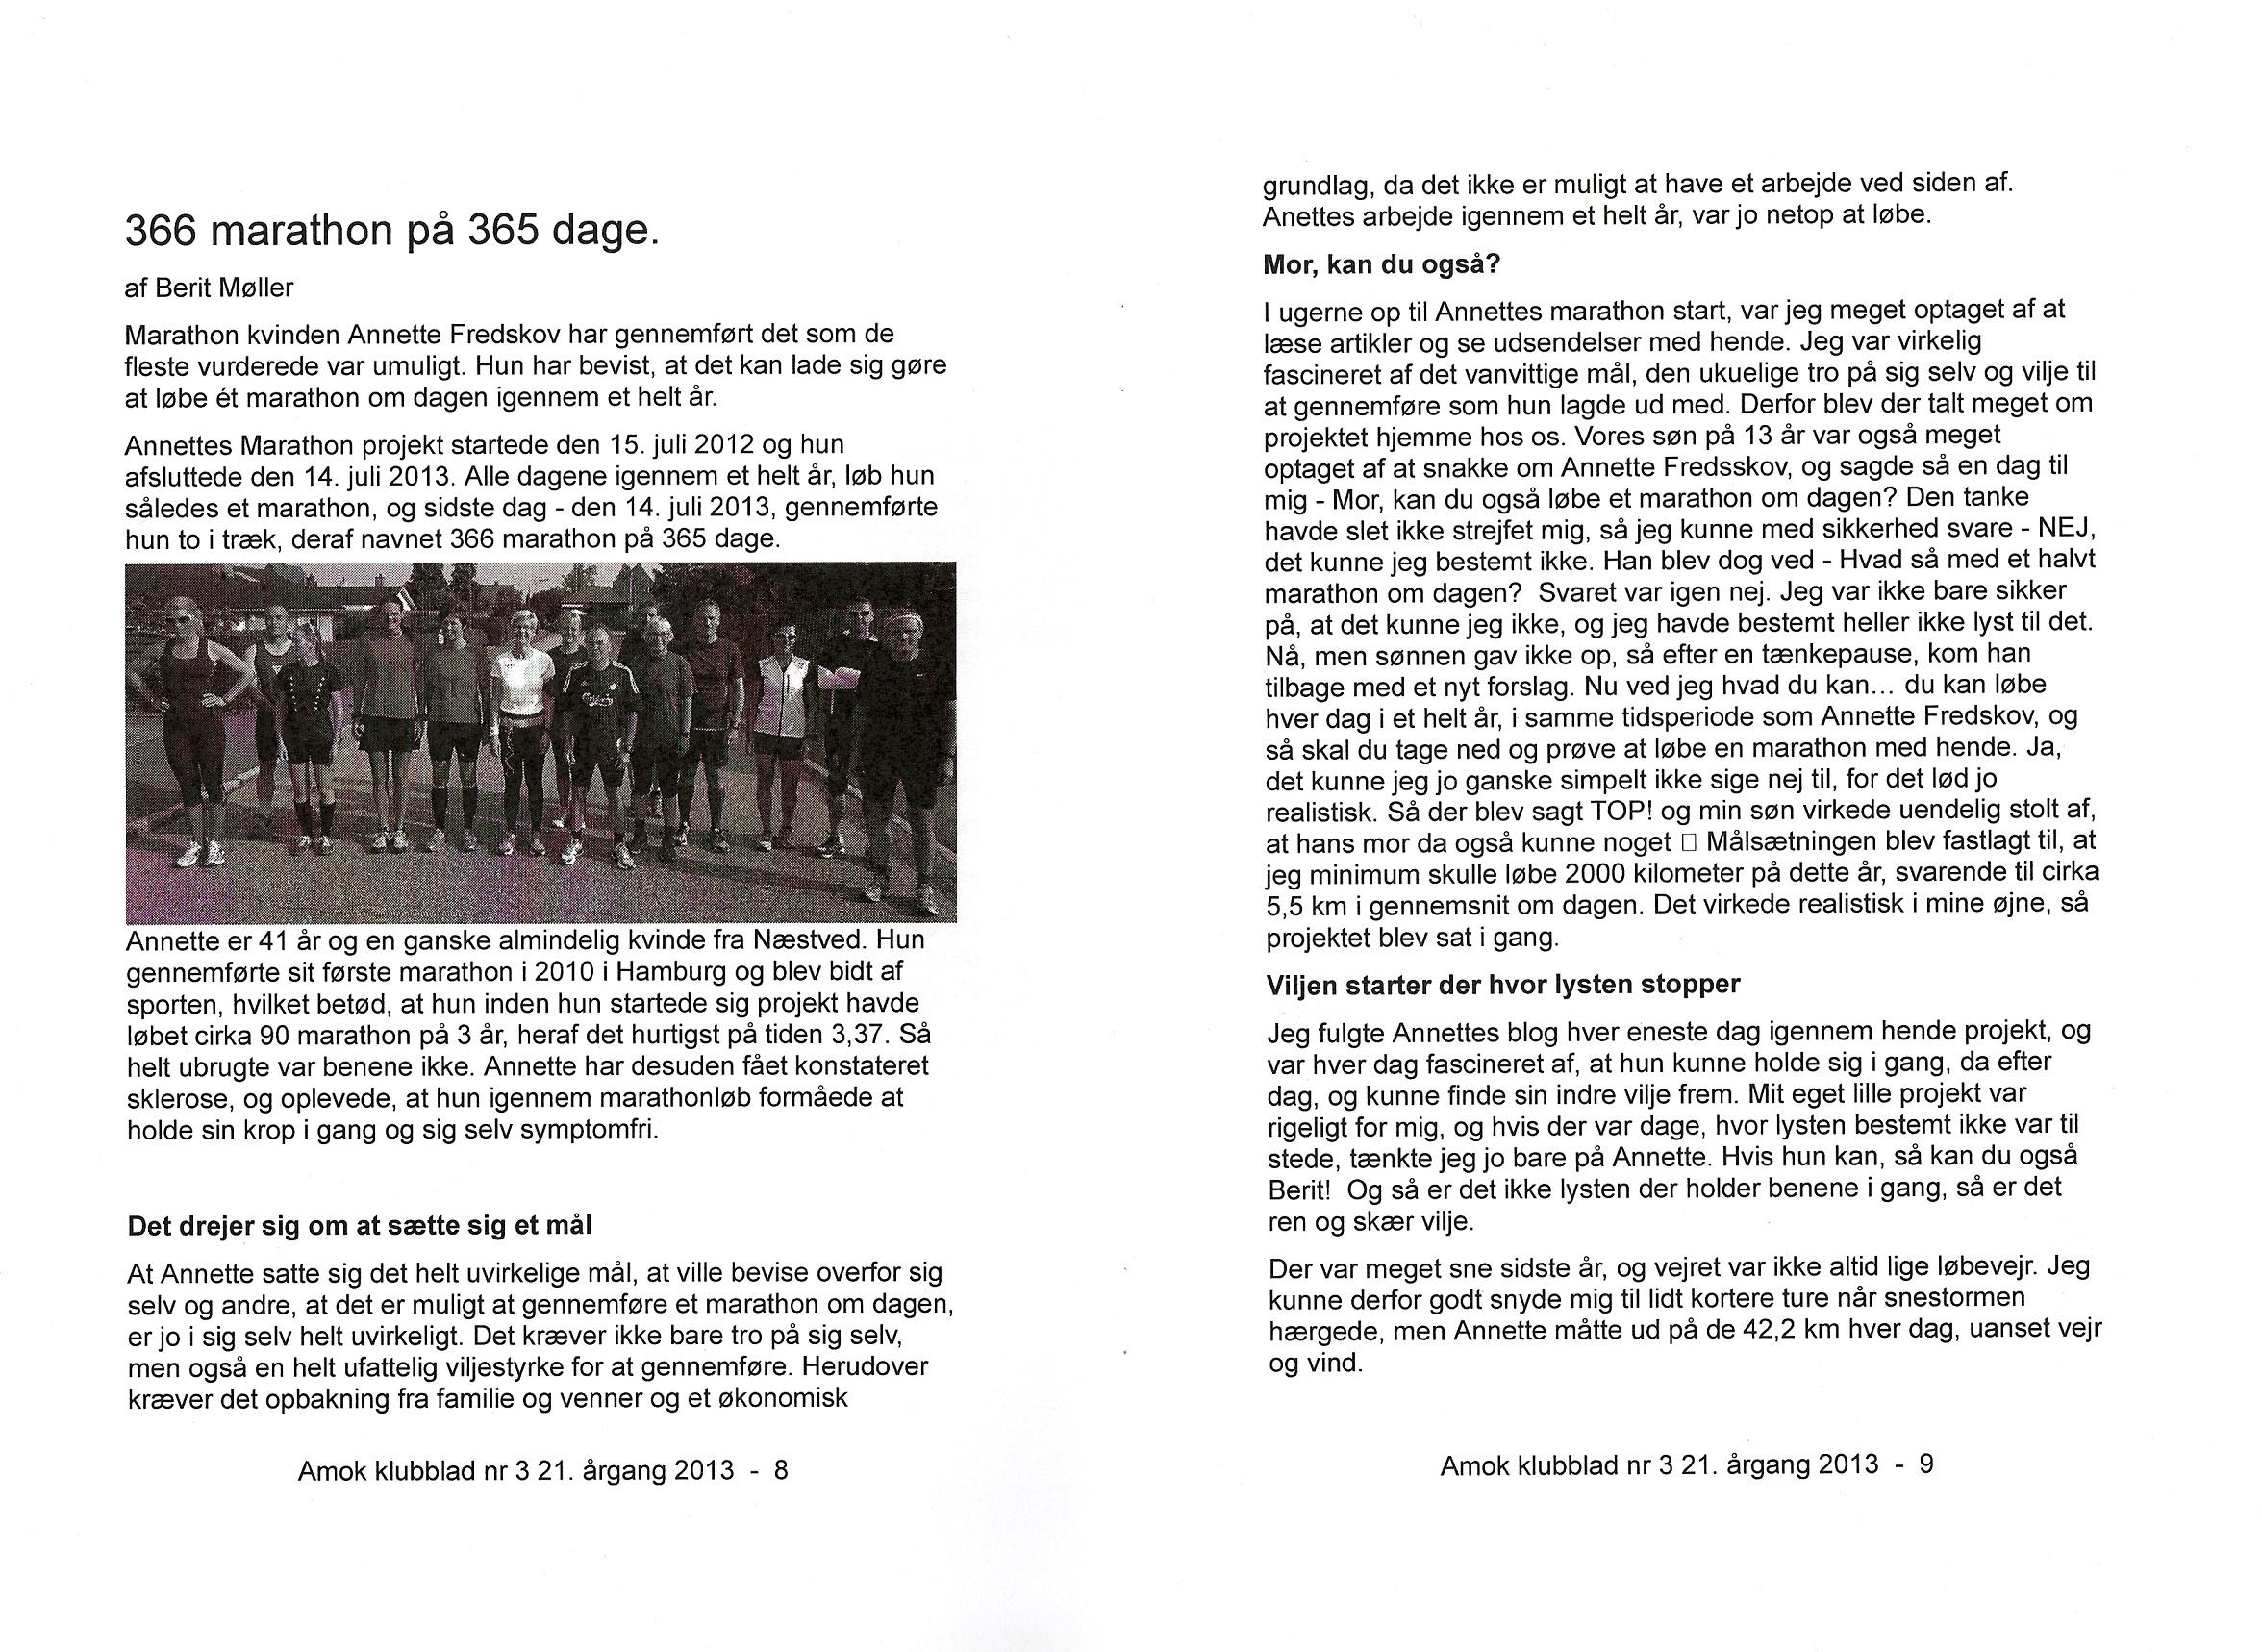 AMOK Medlemsblad 2013.09 #3 - 2